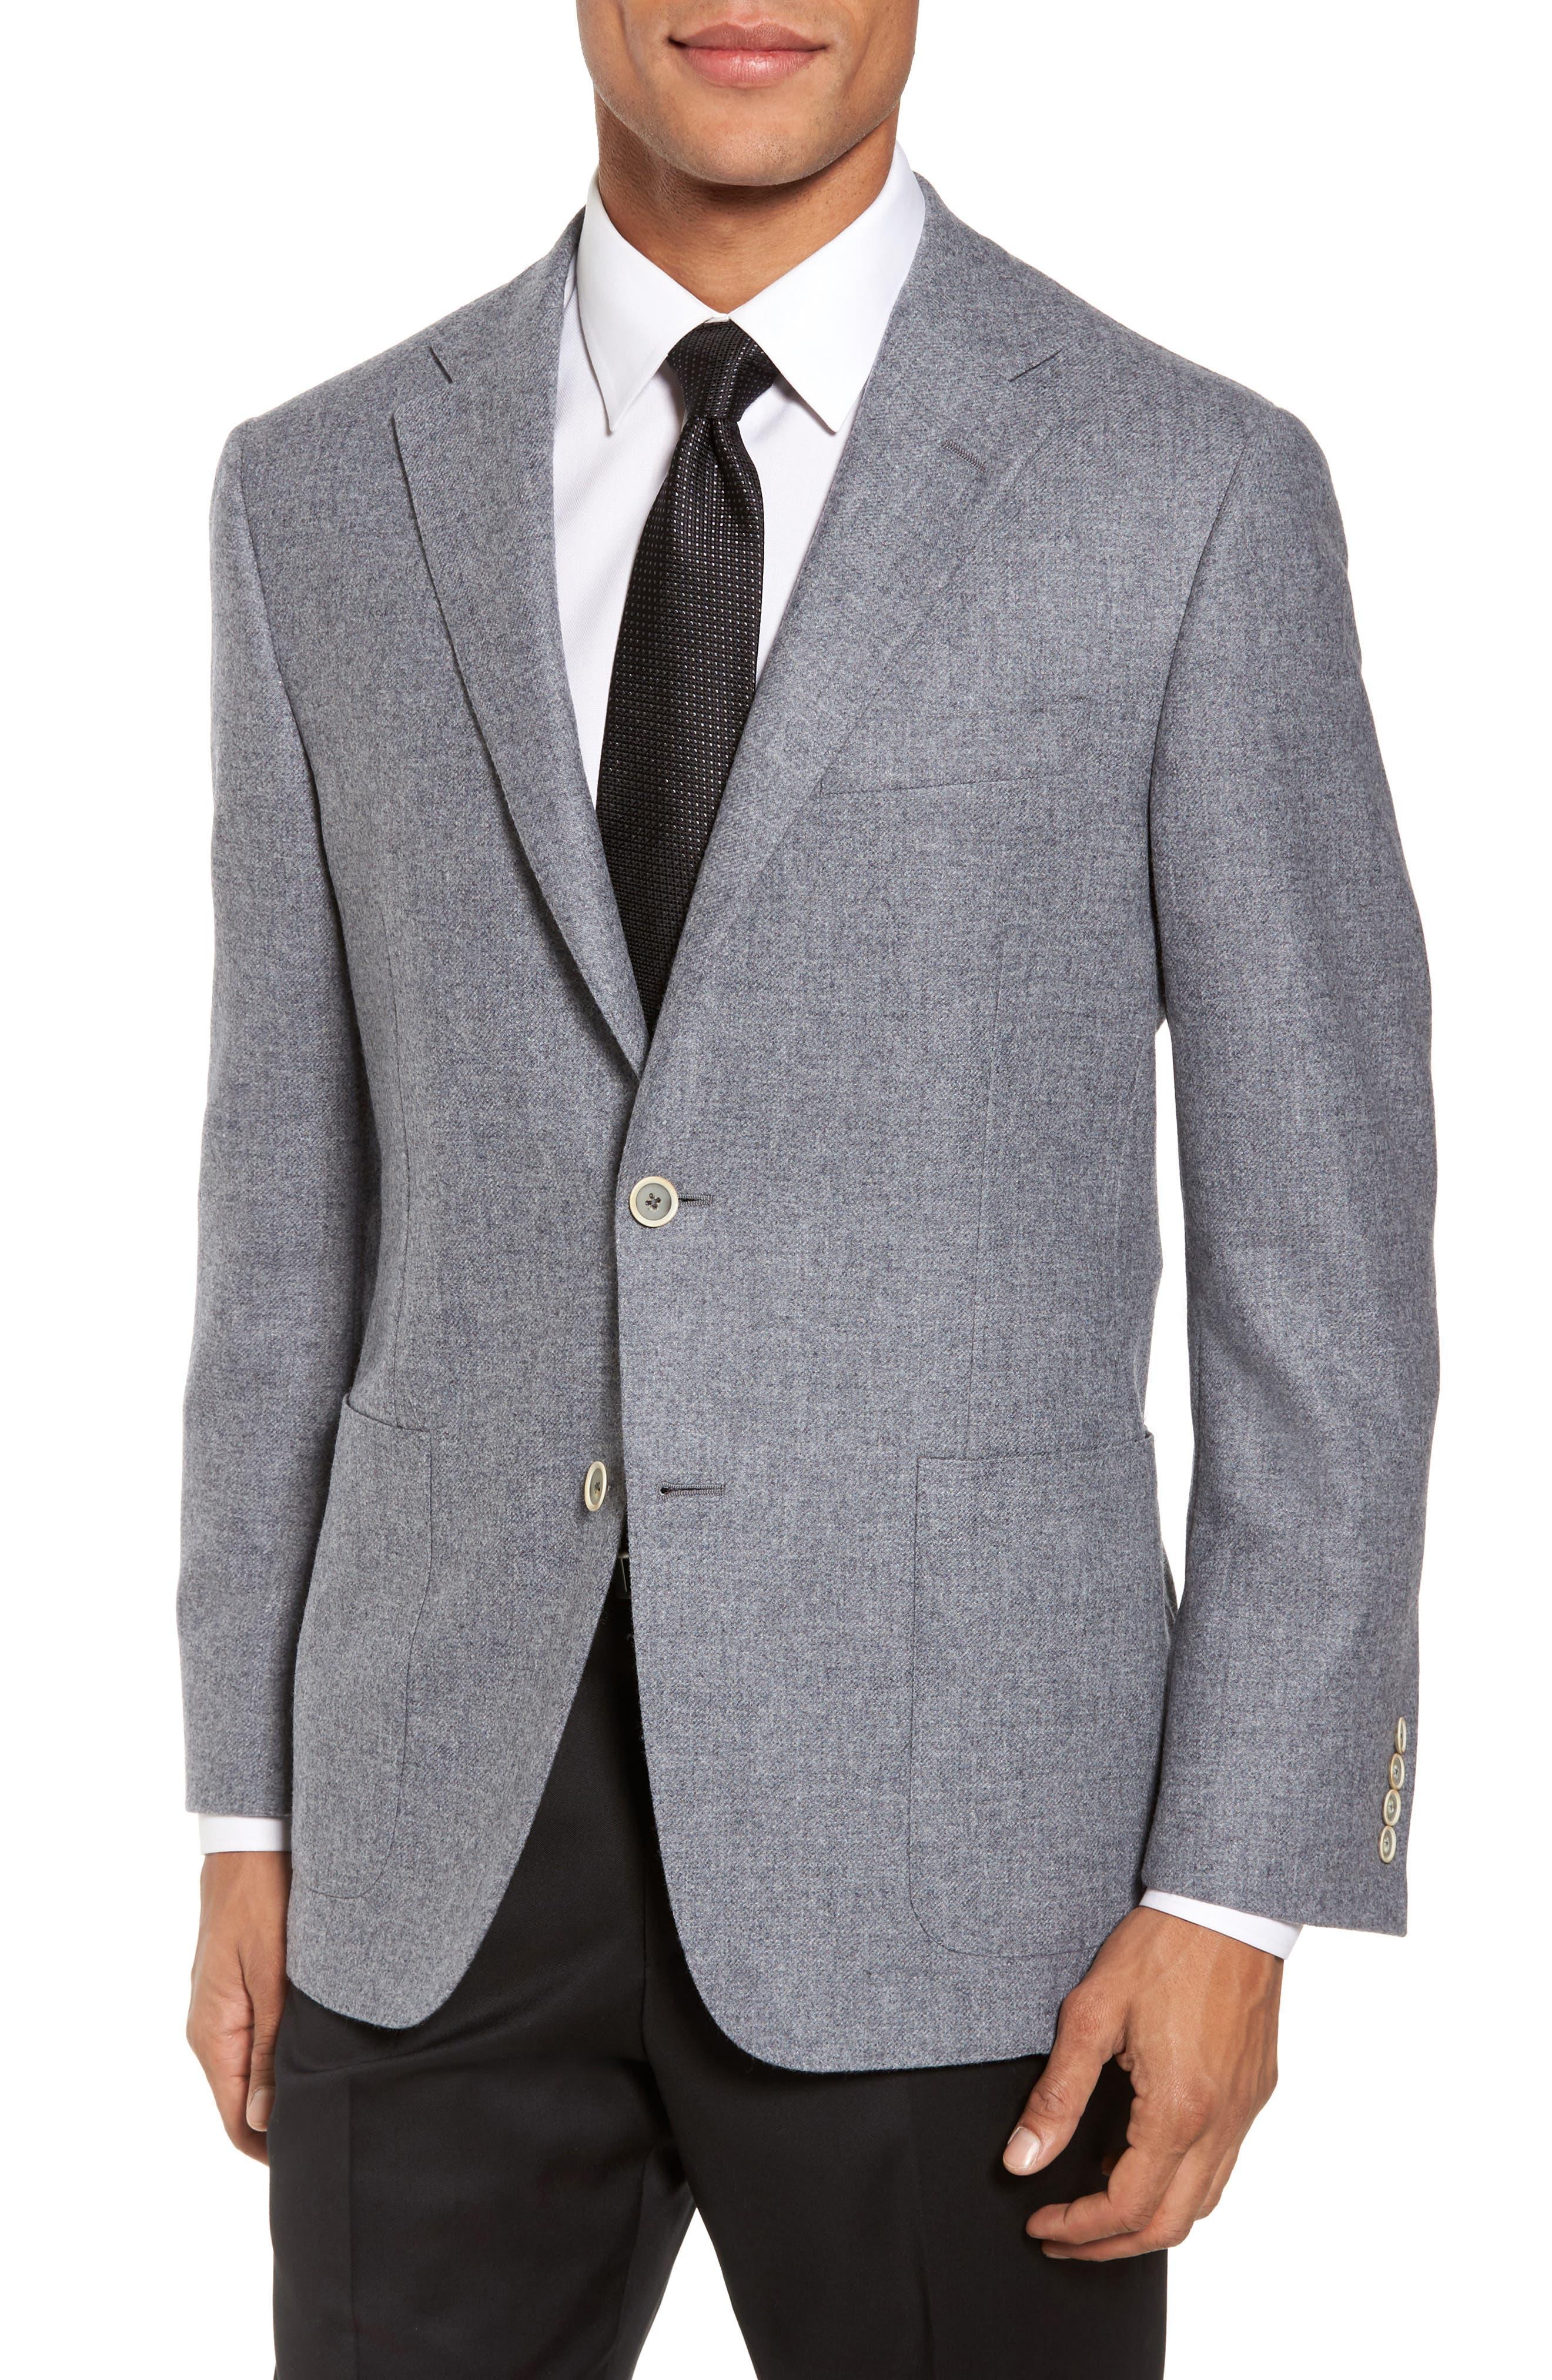 Main Image - Hickey Freeman Classic B Fit Wool & Cashmere Blazer